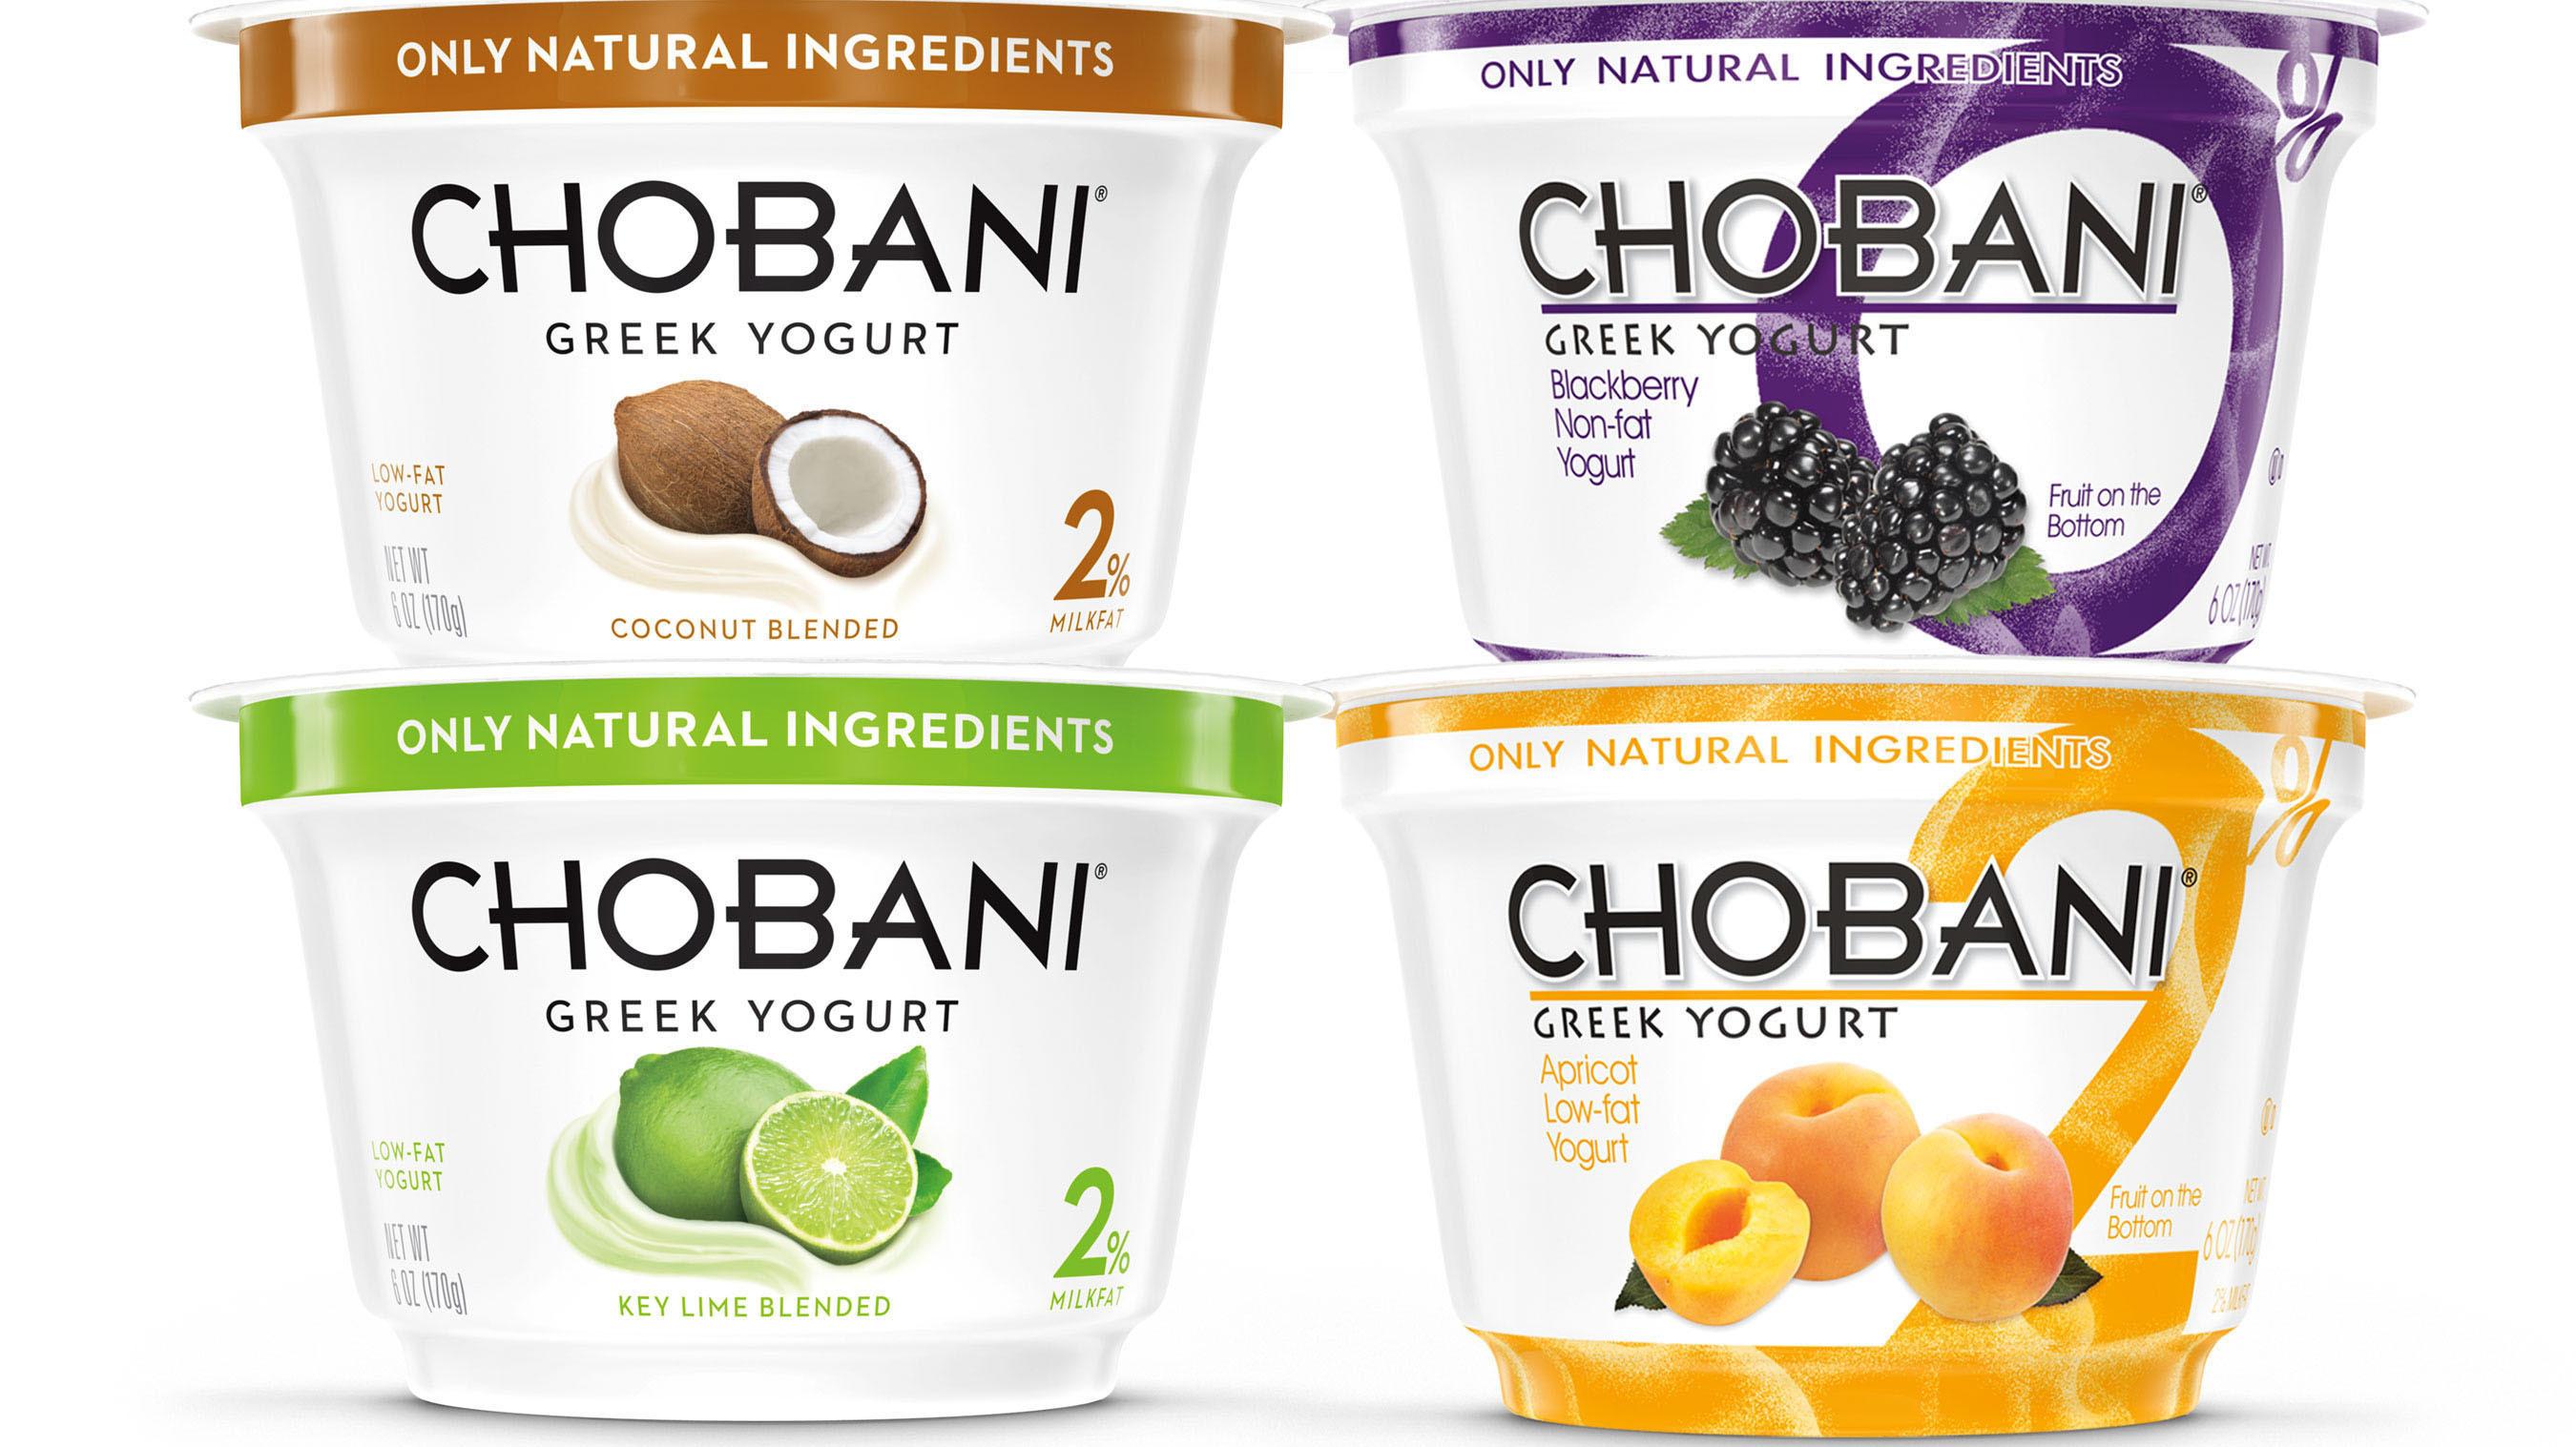 Recalled Yogurt Linked to Fungus Infections